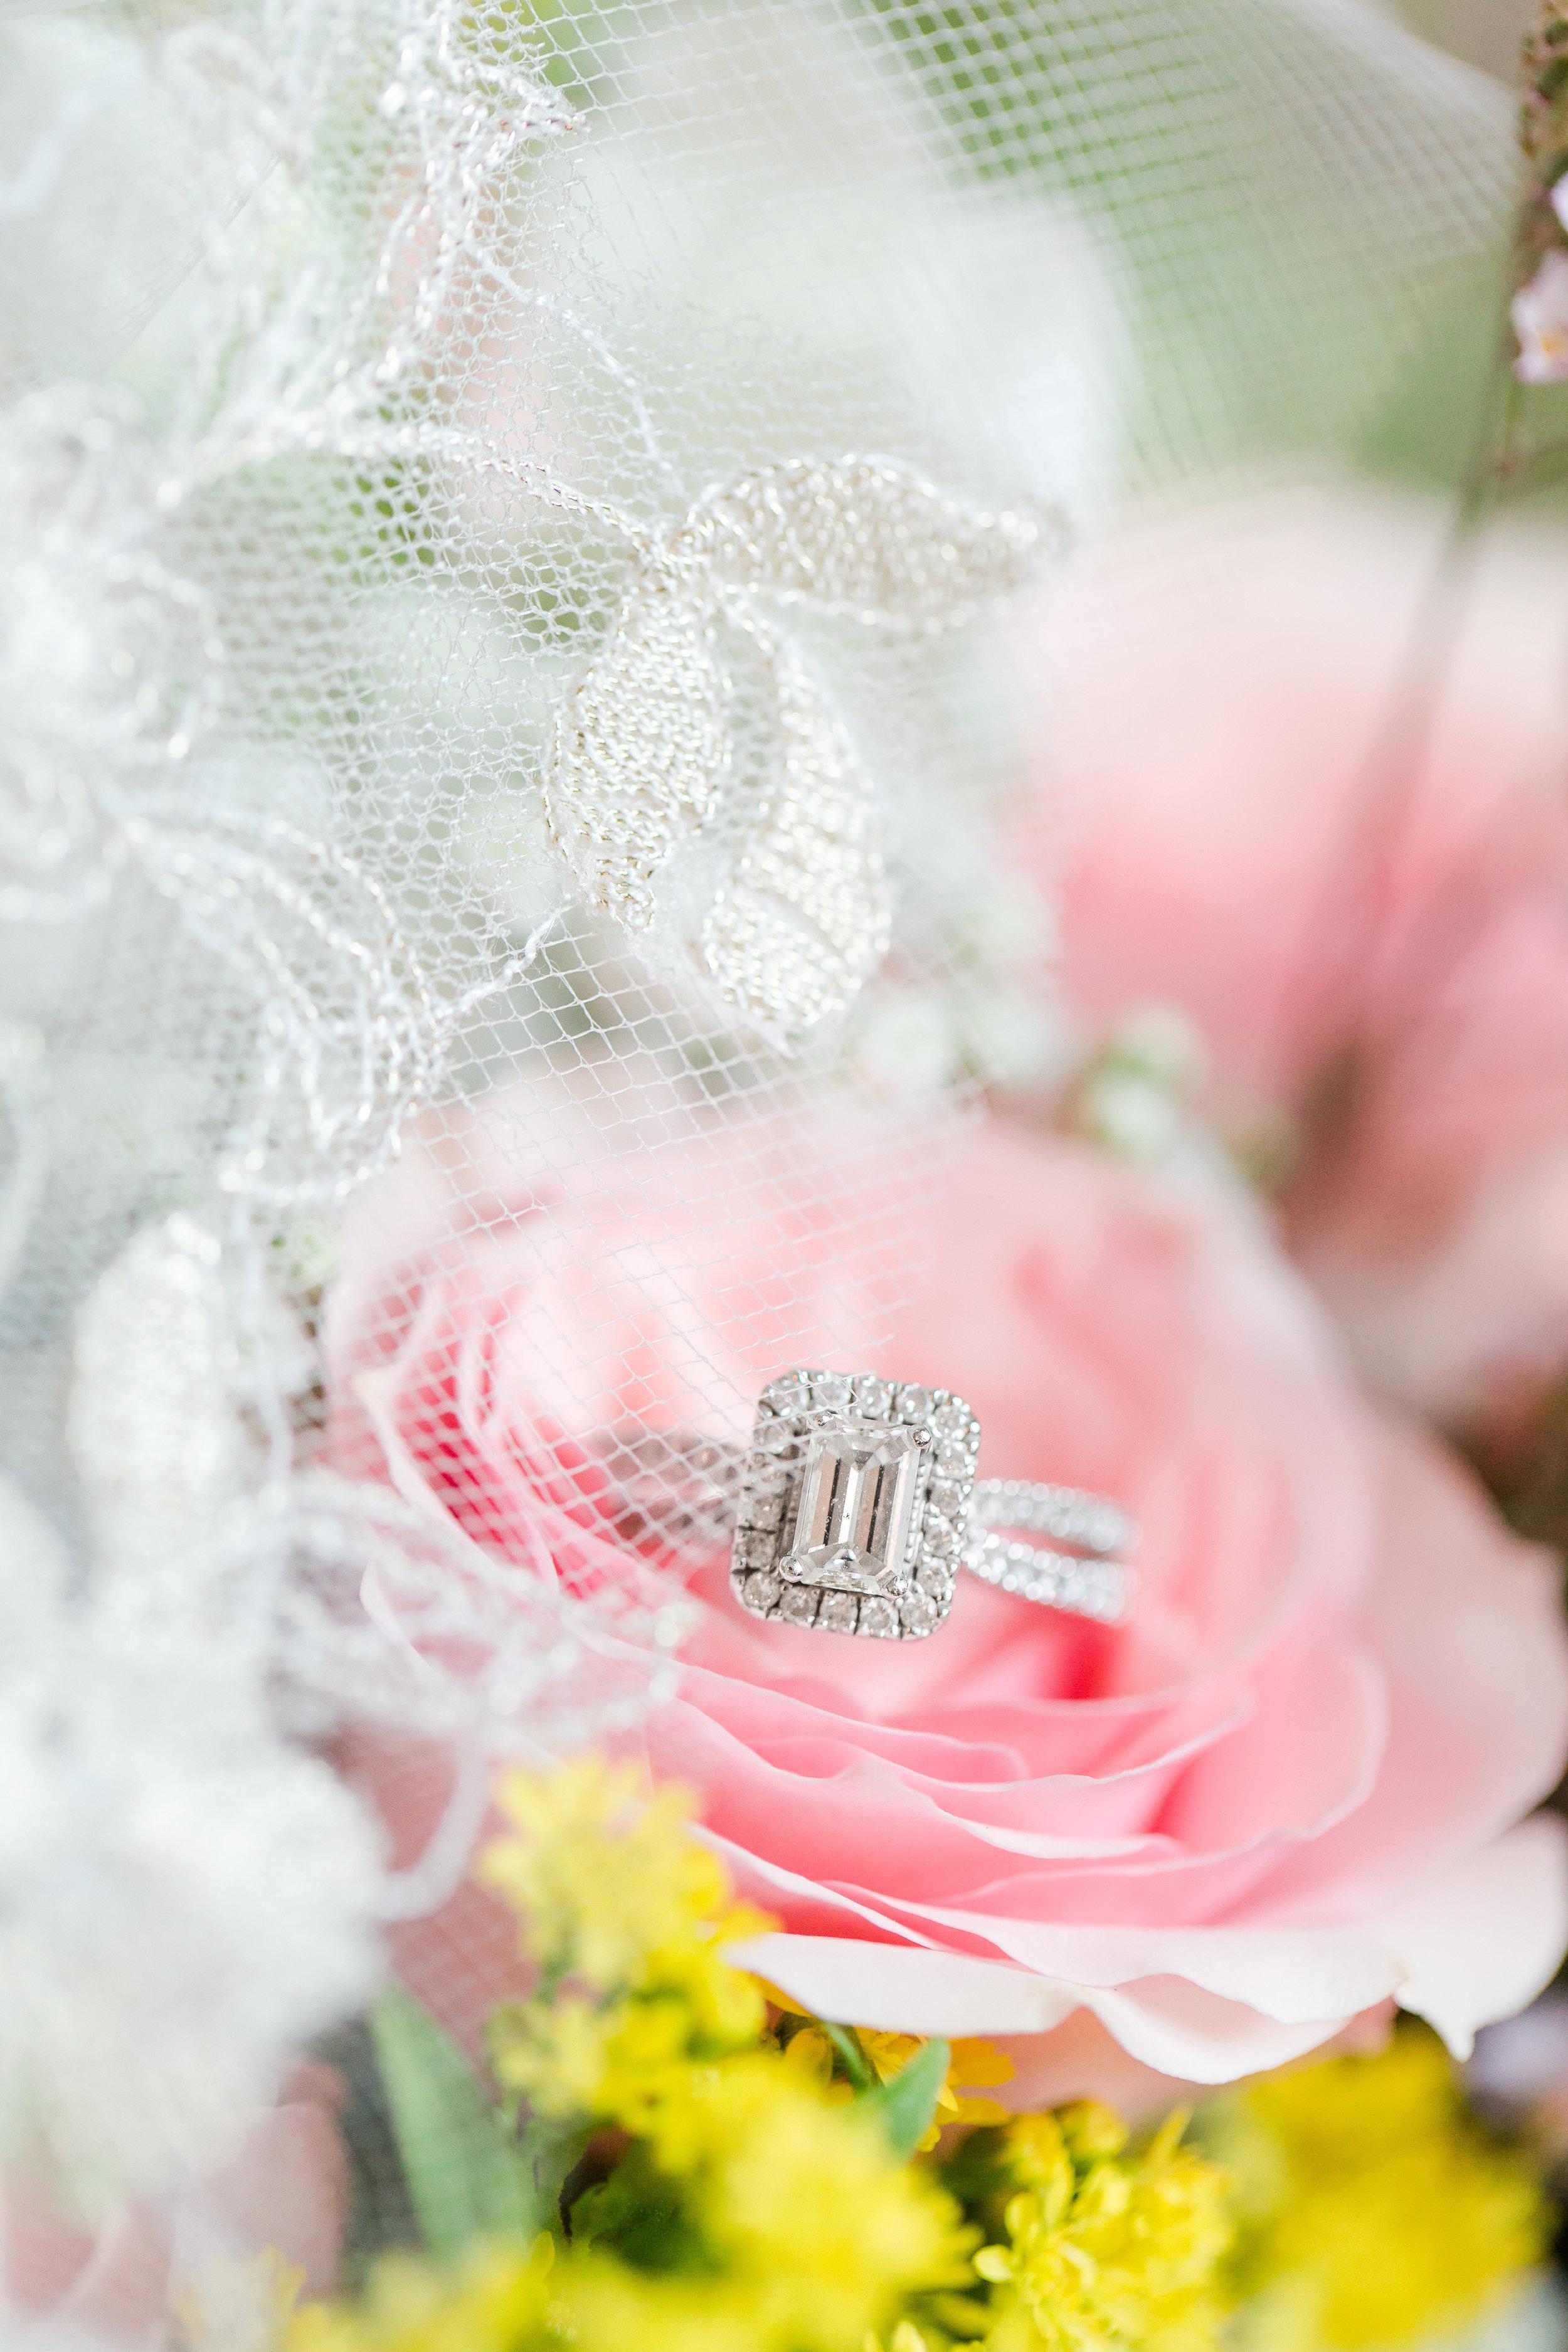 Rectangular Halo Engagement Rings - West Virginia Wedding Photographer - Wedding Venue